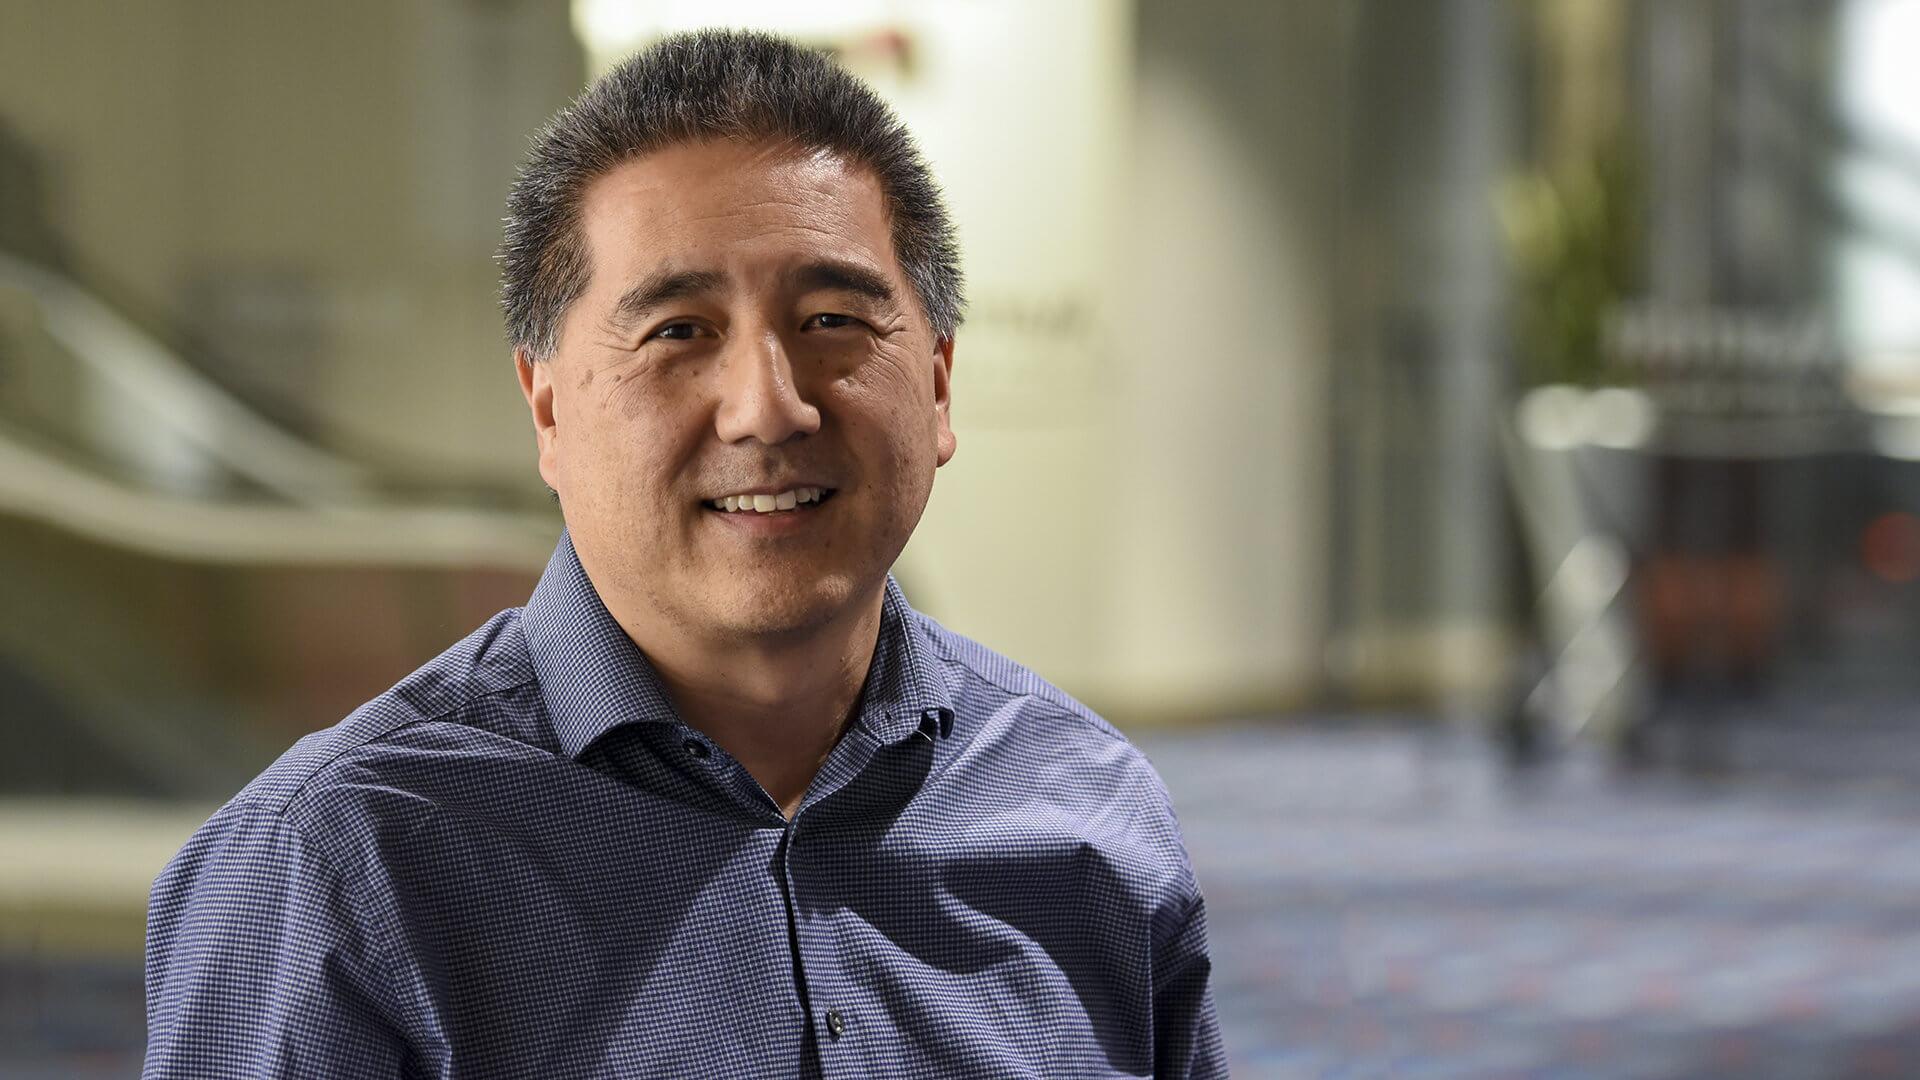 Sacramento Mandarins' Jim Tabuchi elected to DCI Board of Directors